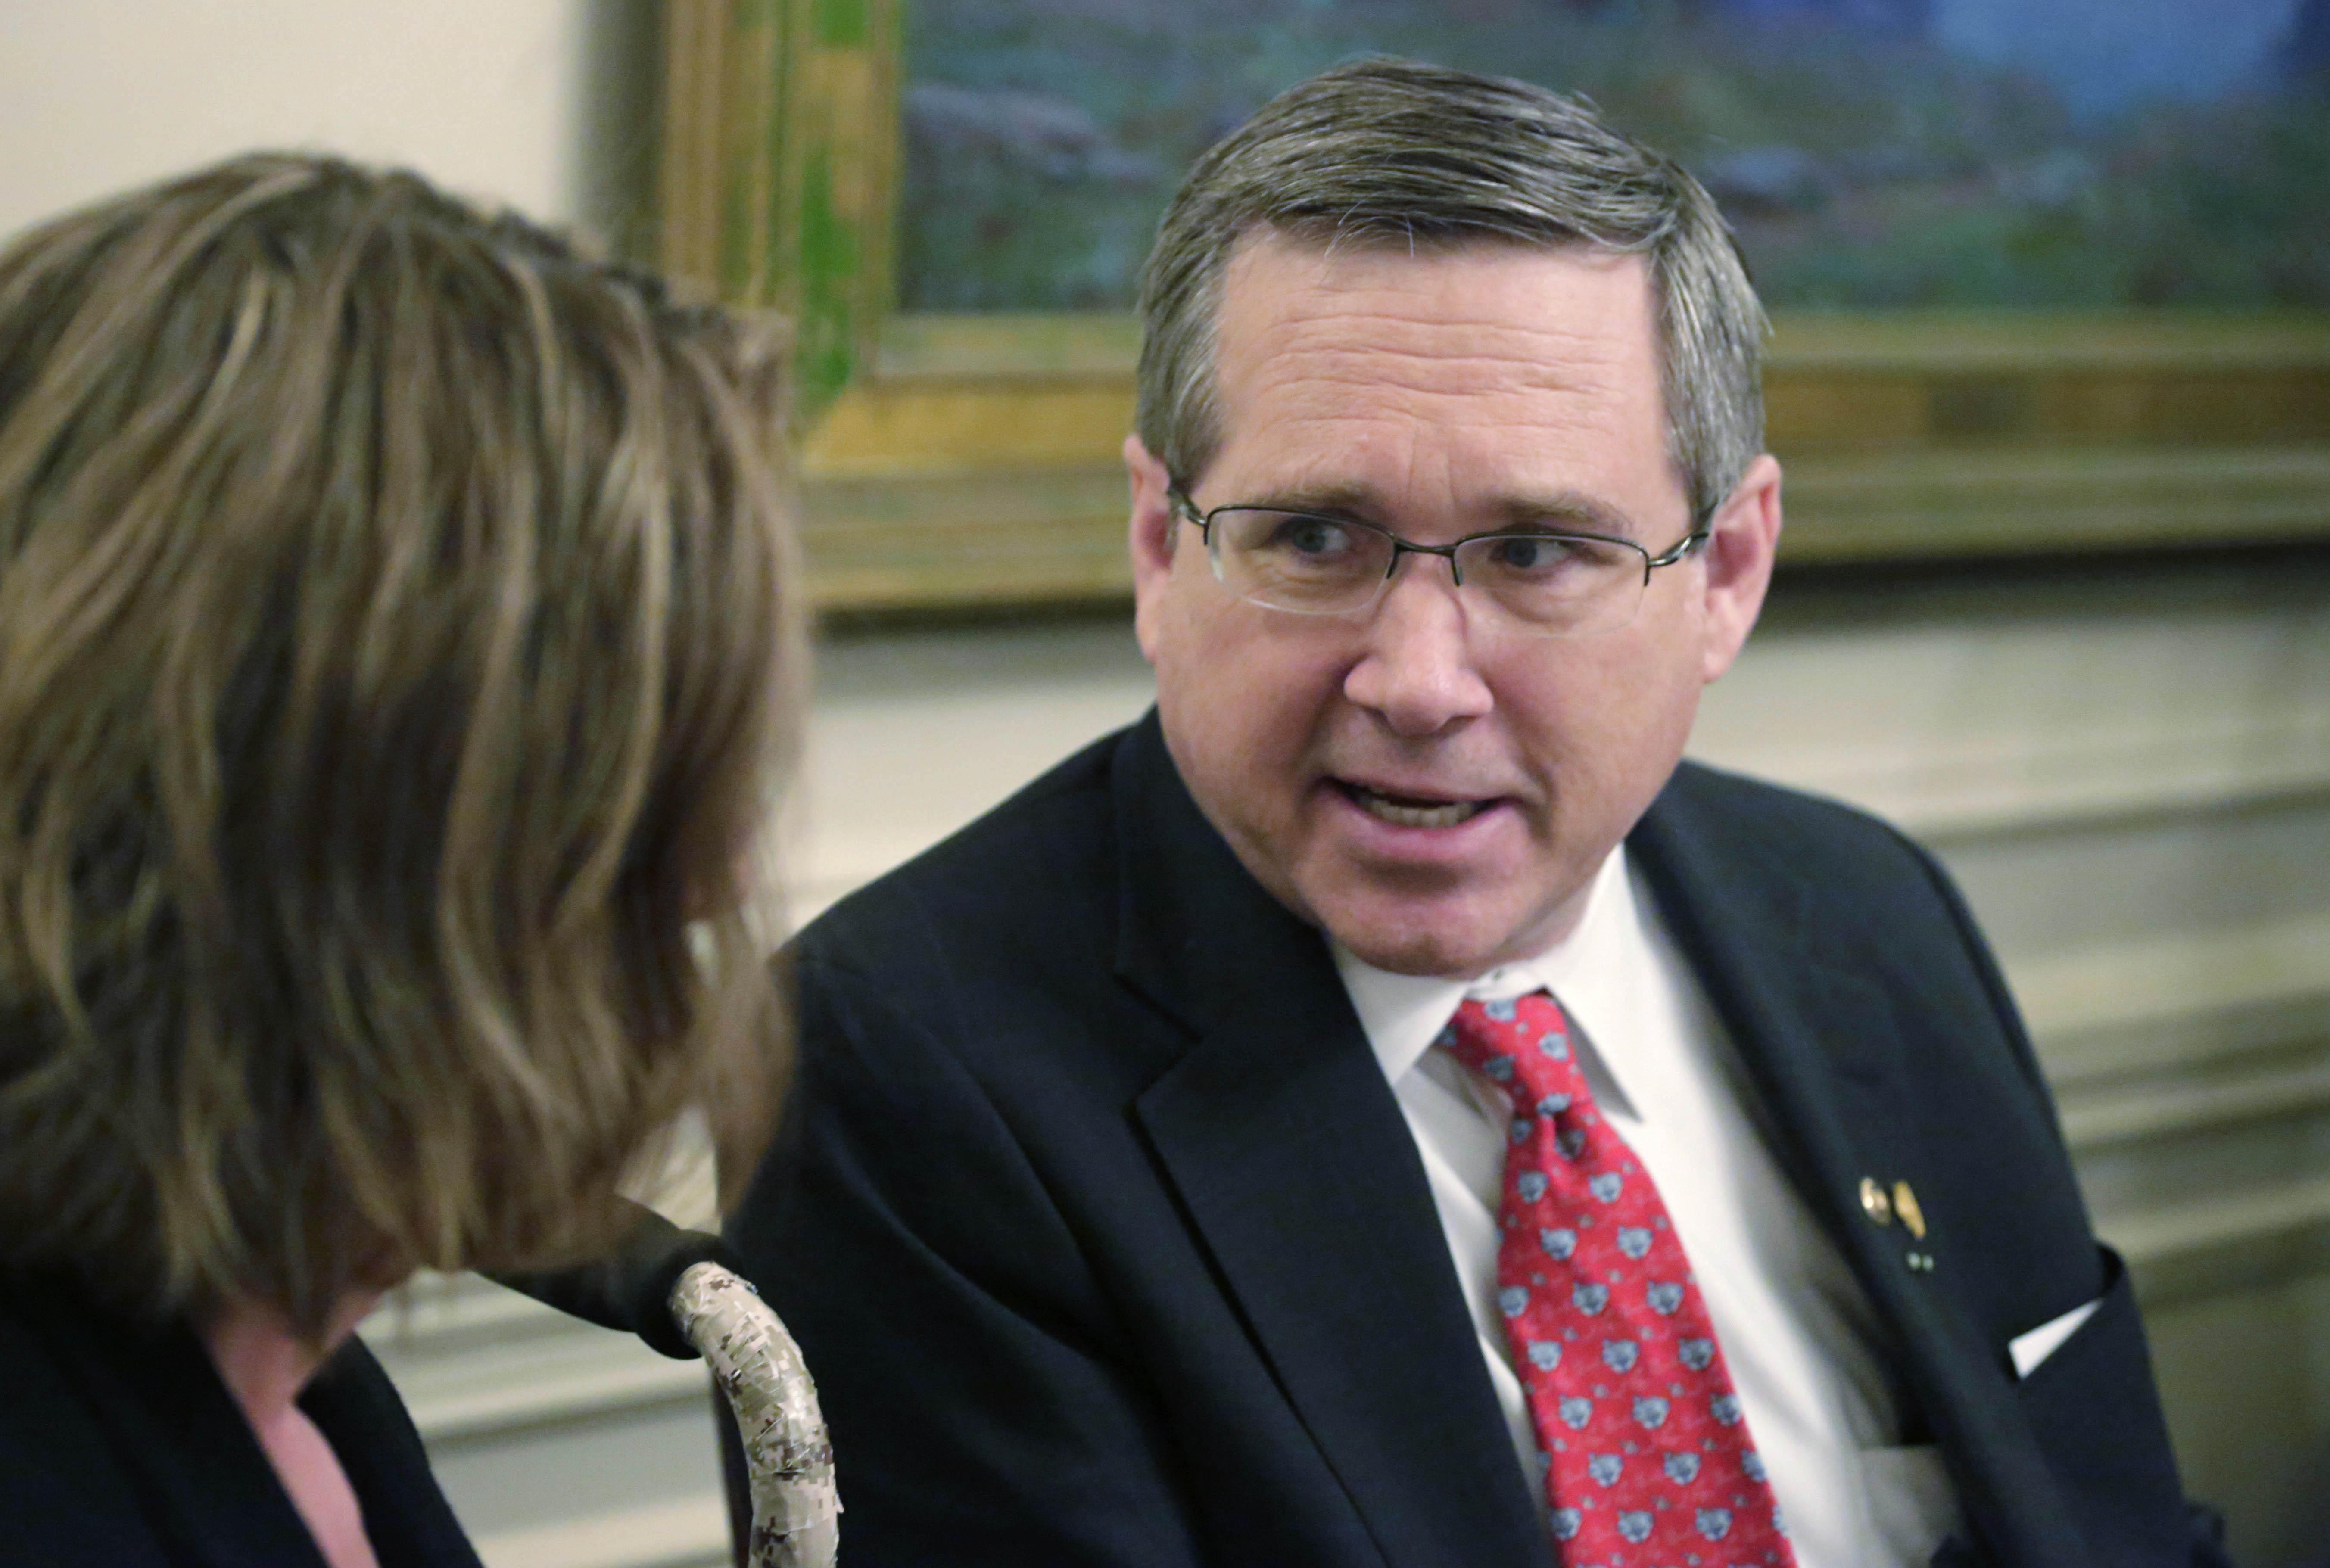 Sen. Mark Kirk, R-Ill., speaks to Illinois Republican Senate leader Christine Radogno in Chicago.